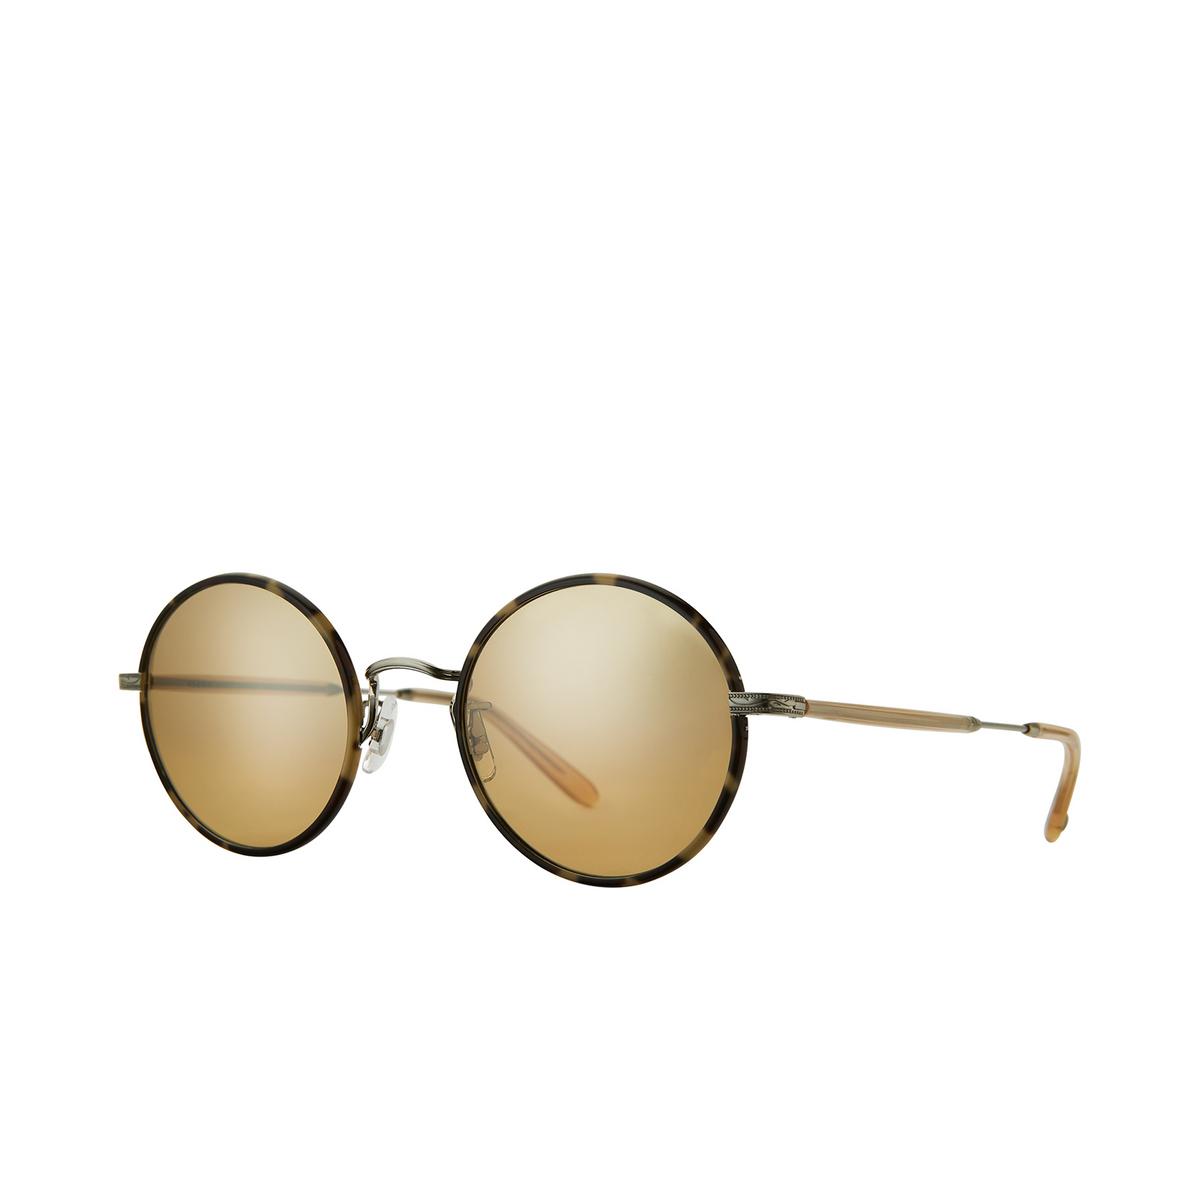 Garrett Leight® Round Sunglasses: Fonda Sun color Marzipan - Brushed Silver Mar-bs-b/hm.